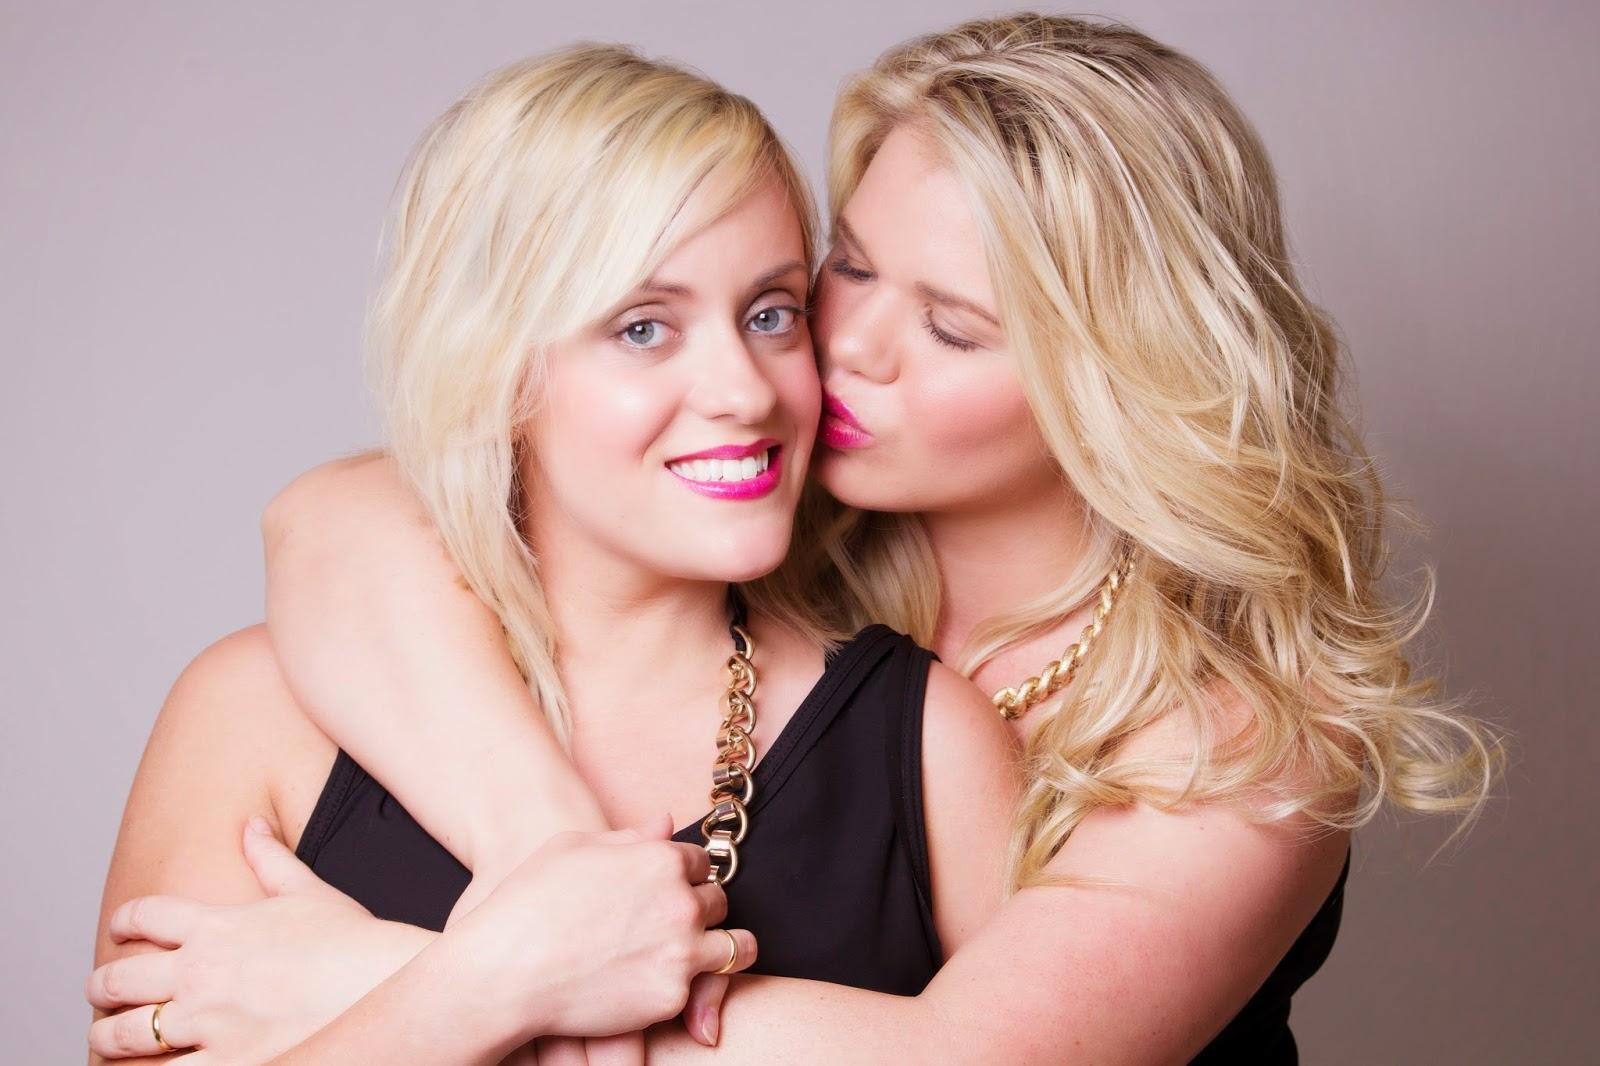 Lipstick Lesbian Tube 101